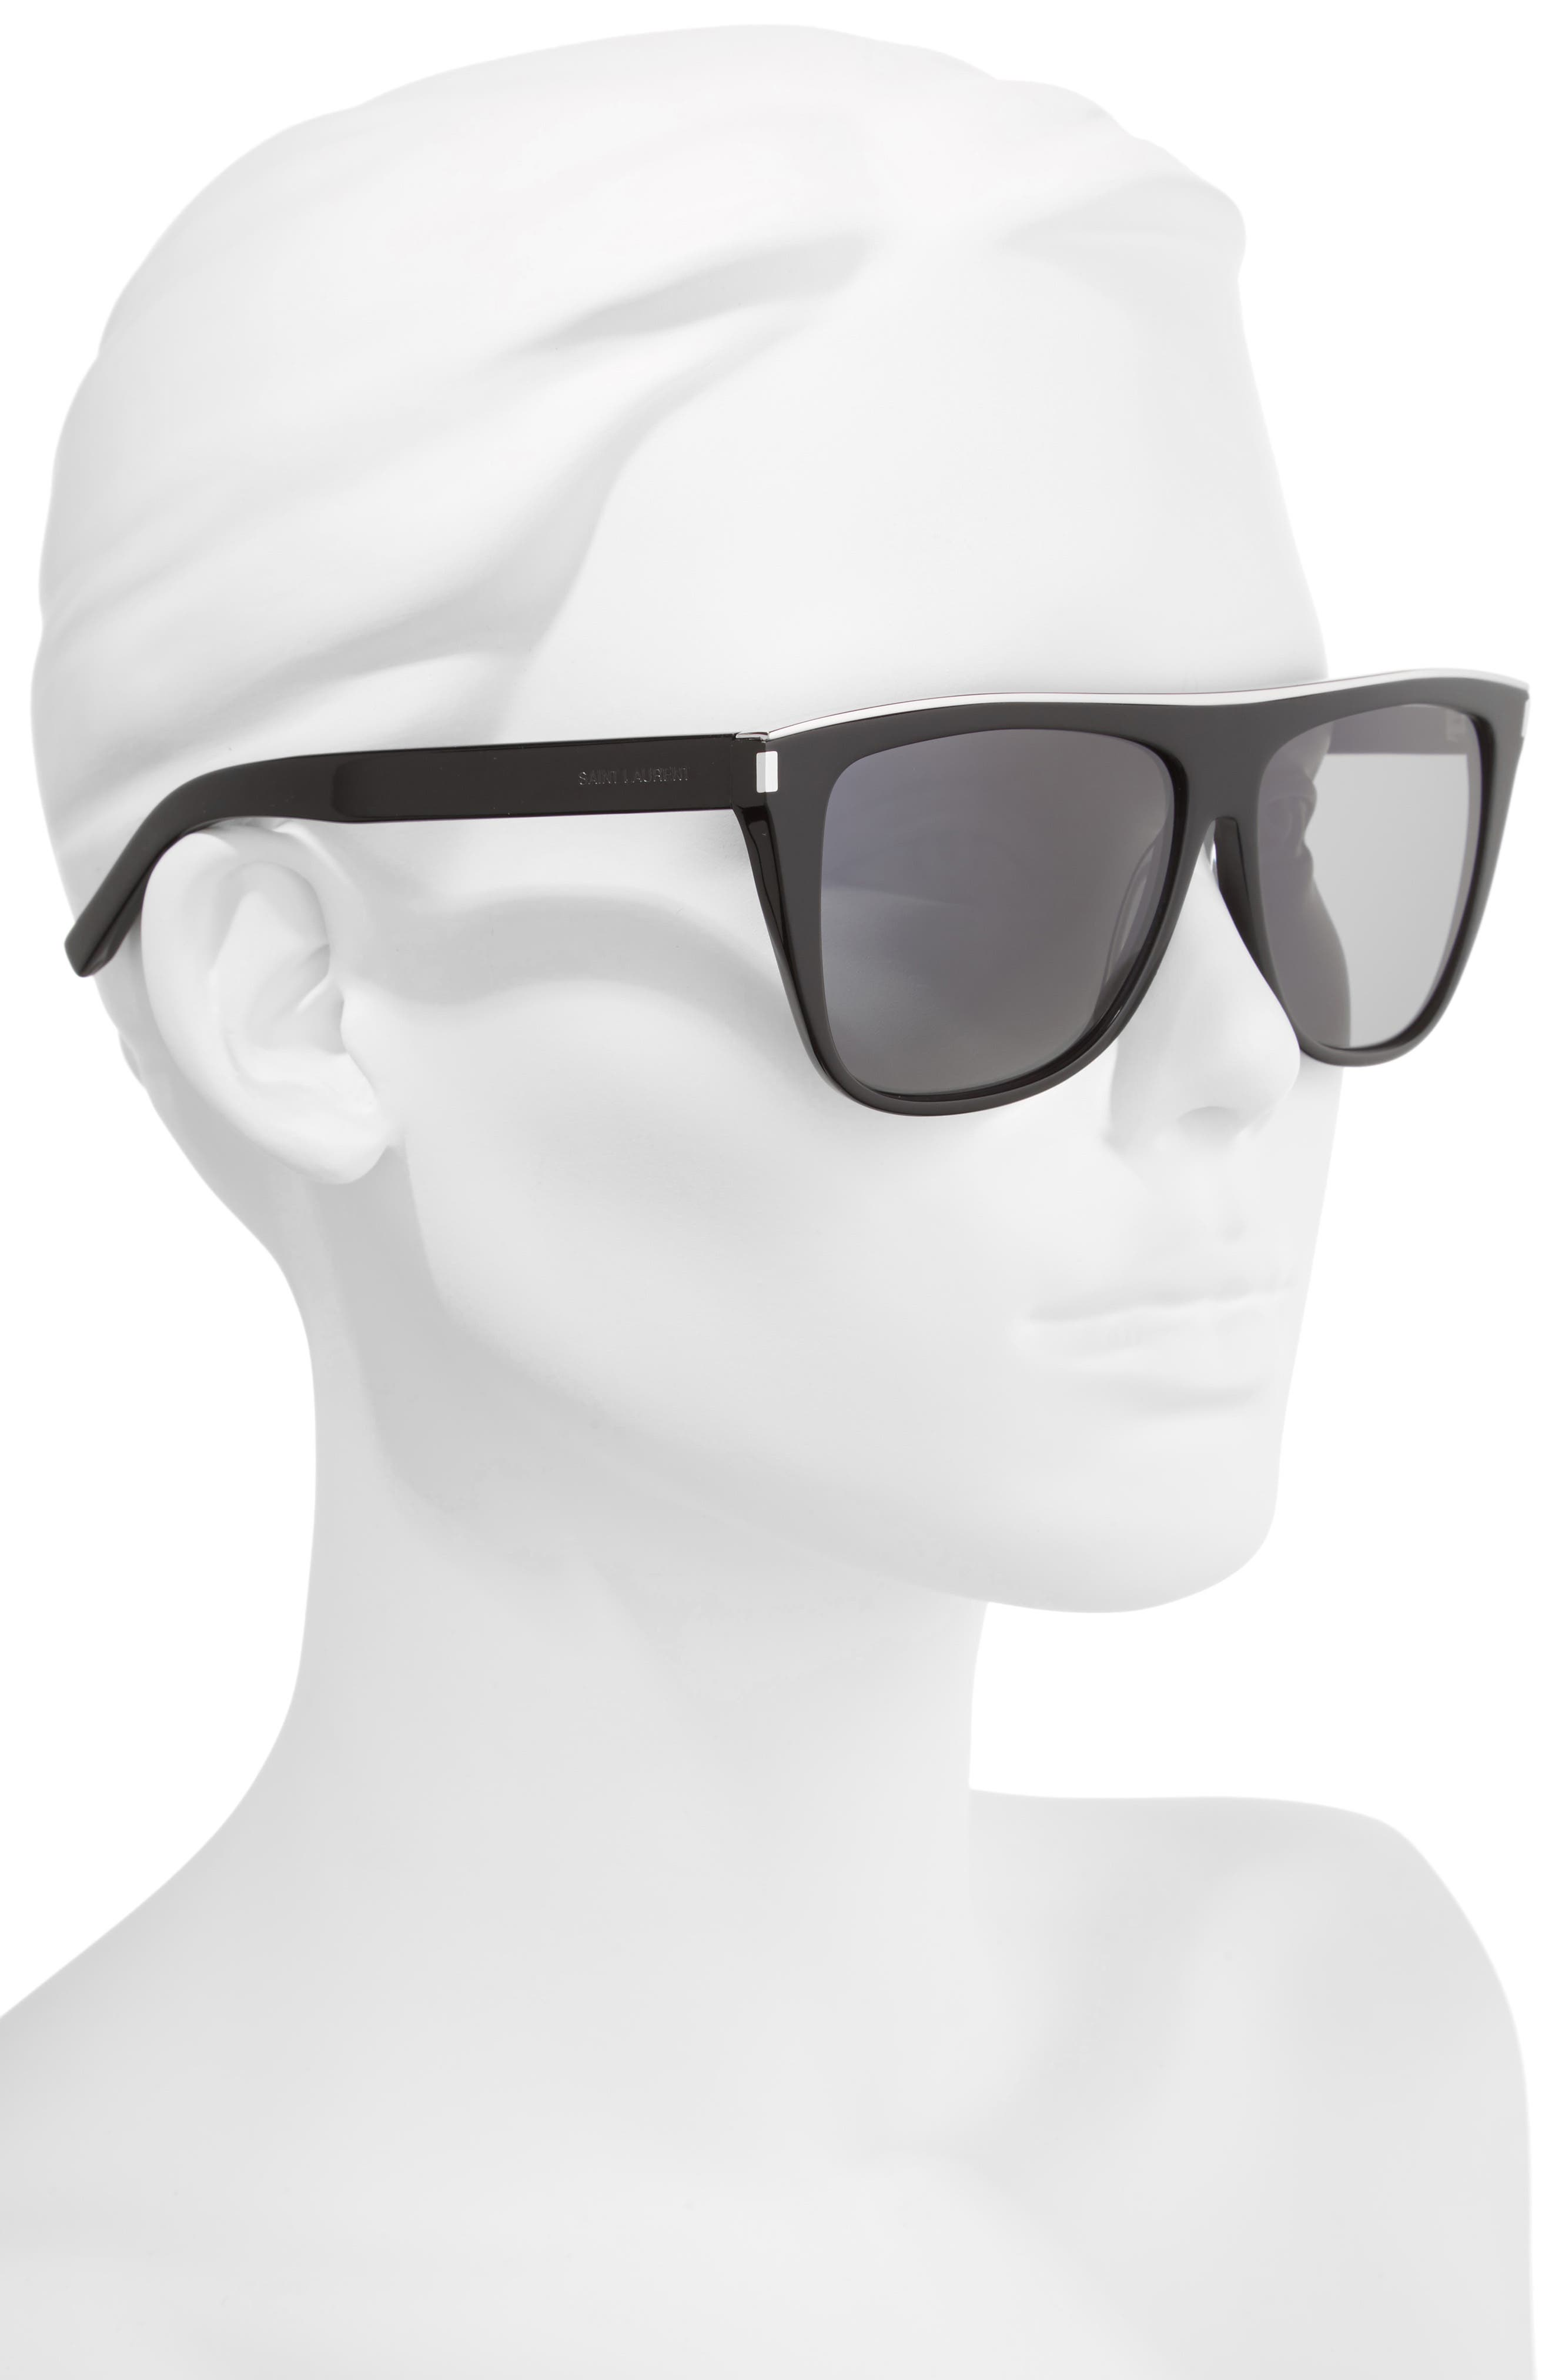 Combi 59mm Flat Top Sunglasses,                             Alternate thumbnail 2, color,                             Black